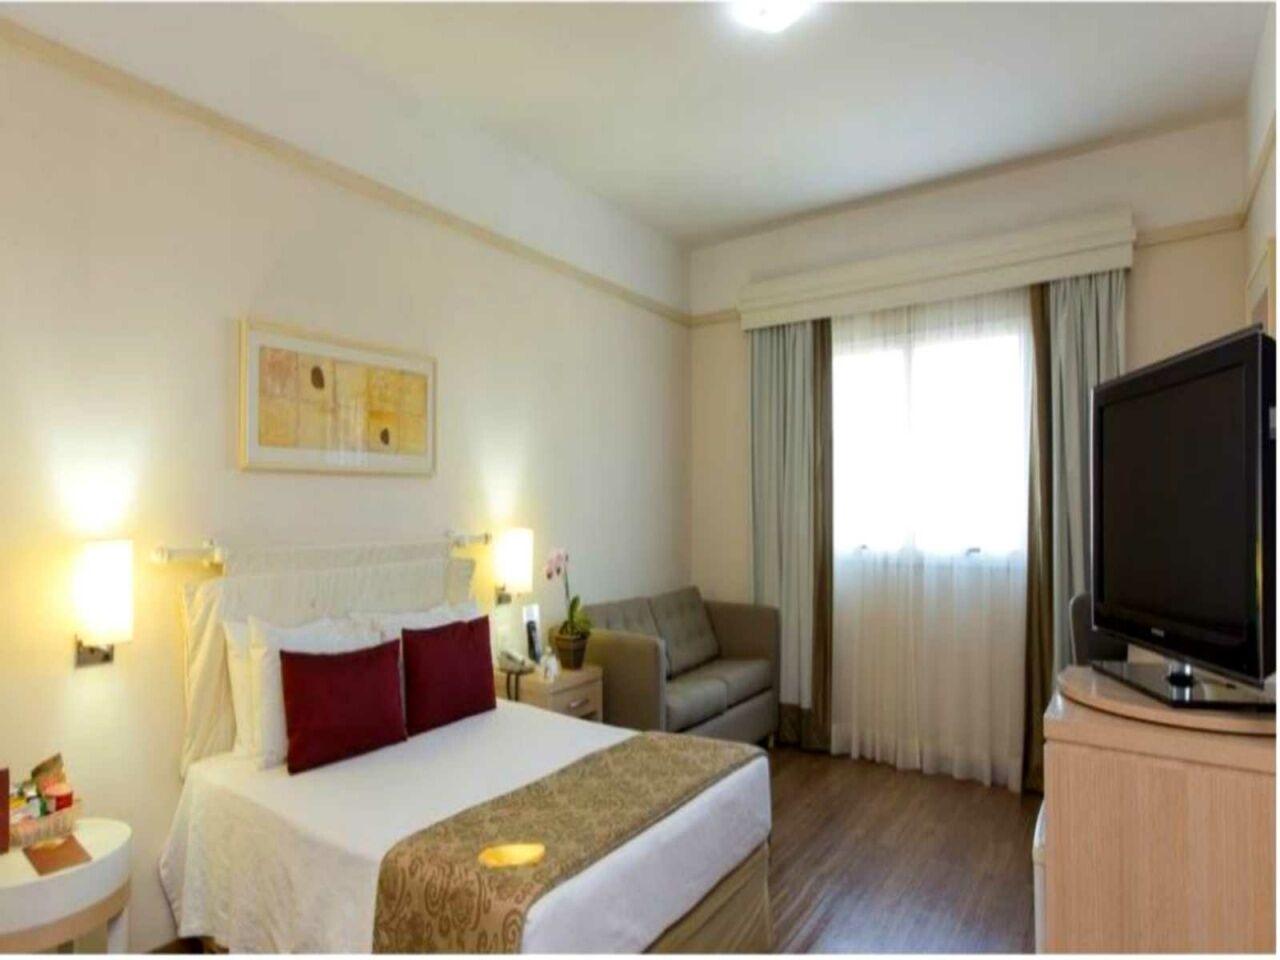 Flat de 1 dormitório à venda em Jardim Burle Marx, Londrina - PR